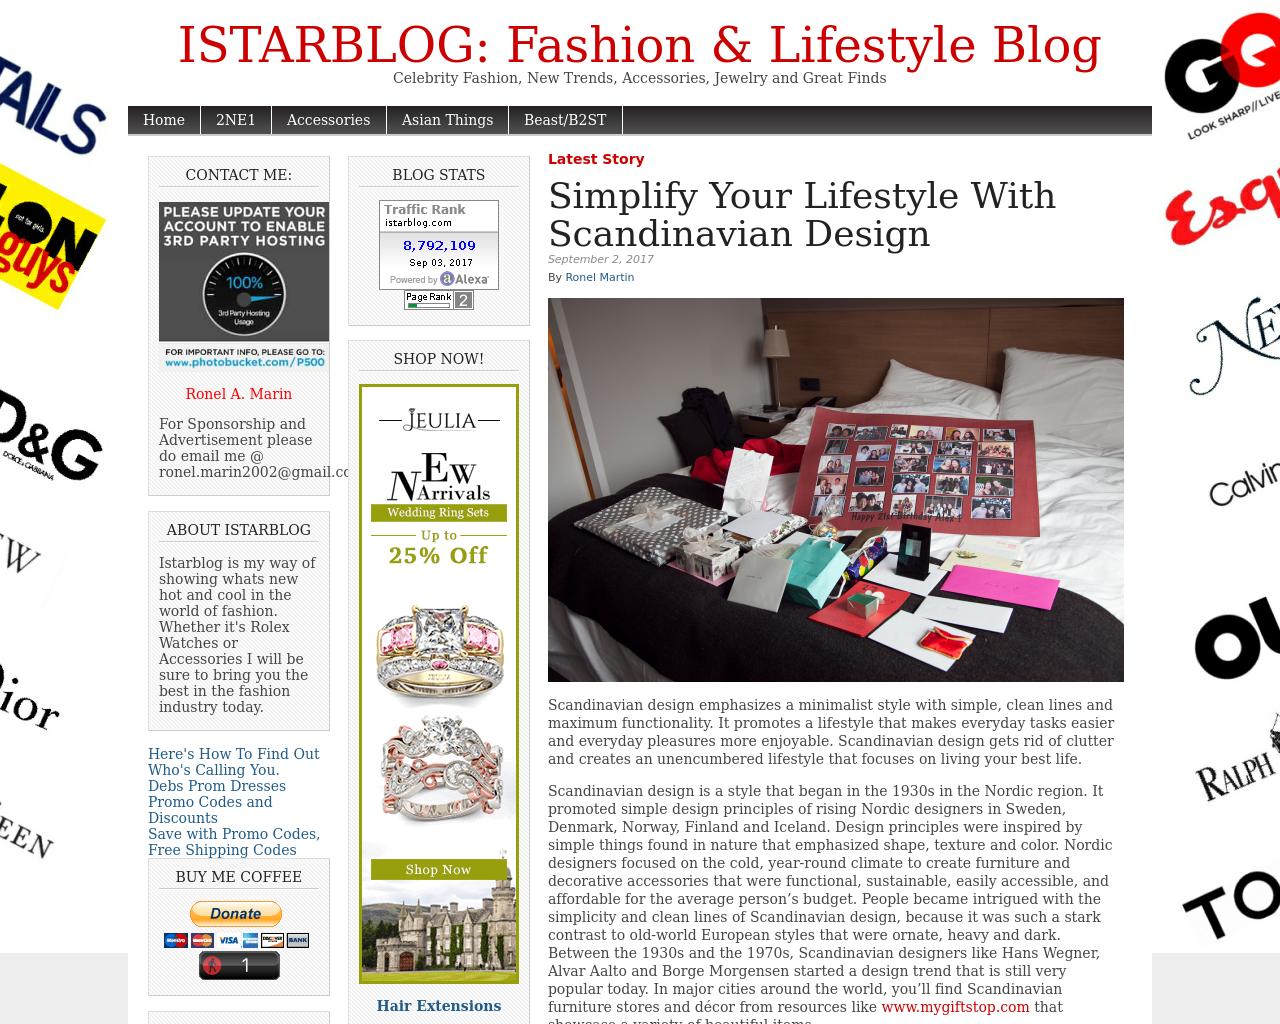 ISTARBLOG---Fashion-&-Lifestyle-Blog-Advertising-Reviews-Pricing